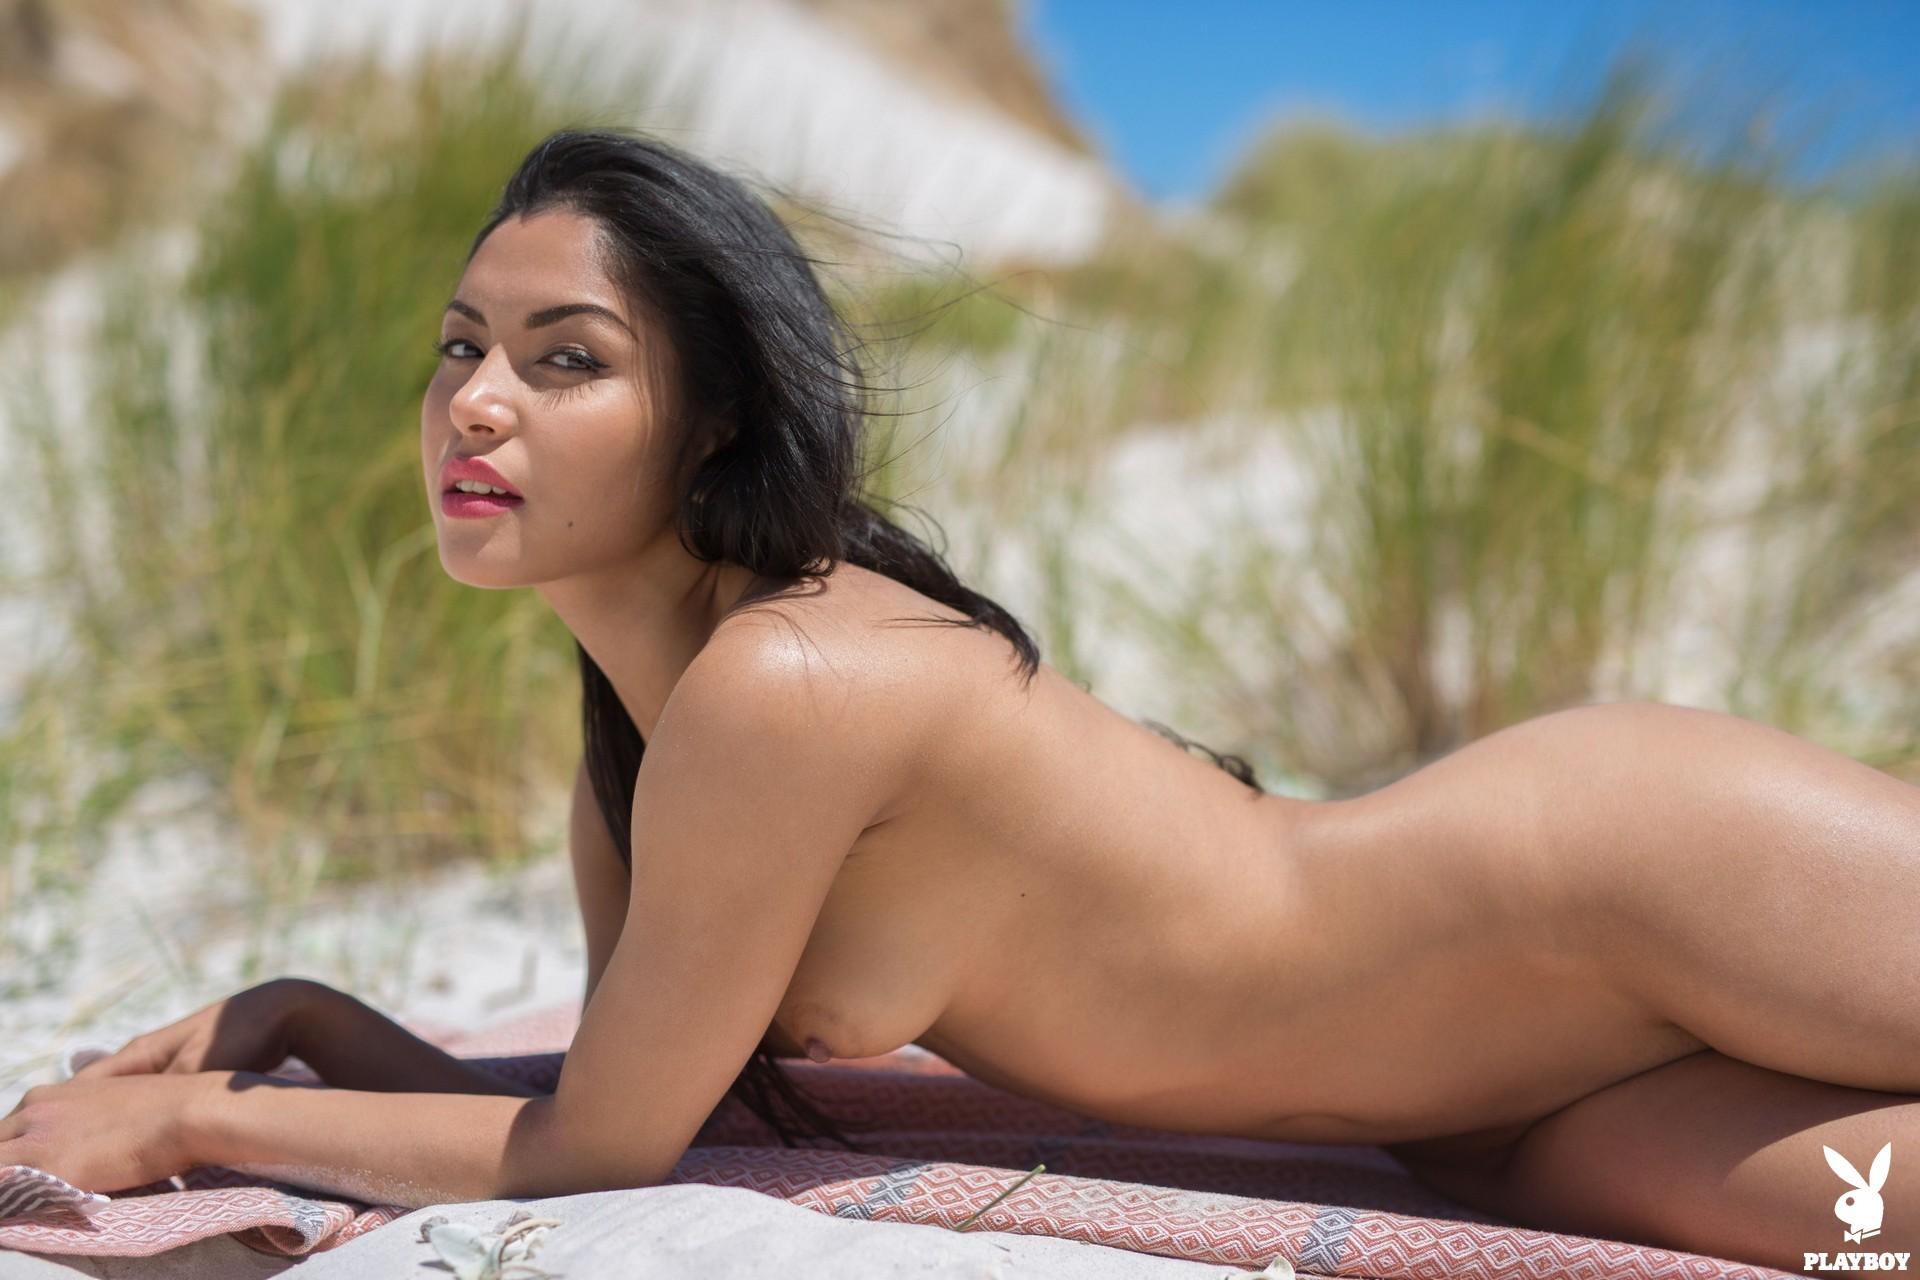 Chloe Rose in  Breezy Paradise - Playboy Plus 23